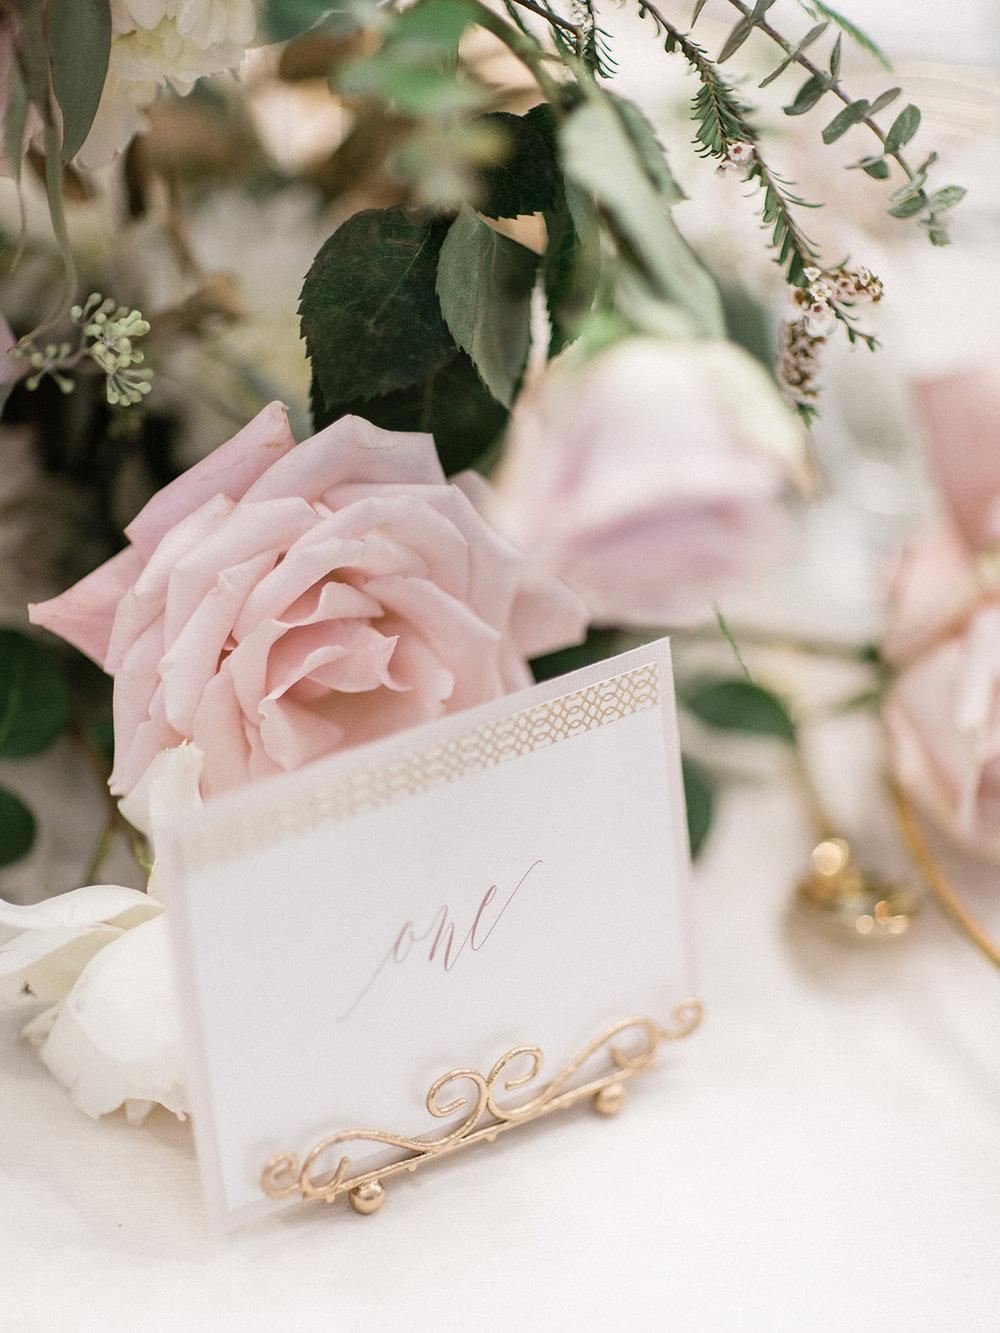 LisaCatherinePhotography_Jasmeen&Darren_Wedding-366_websize.jpg